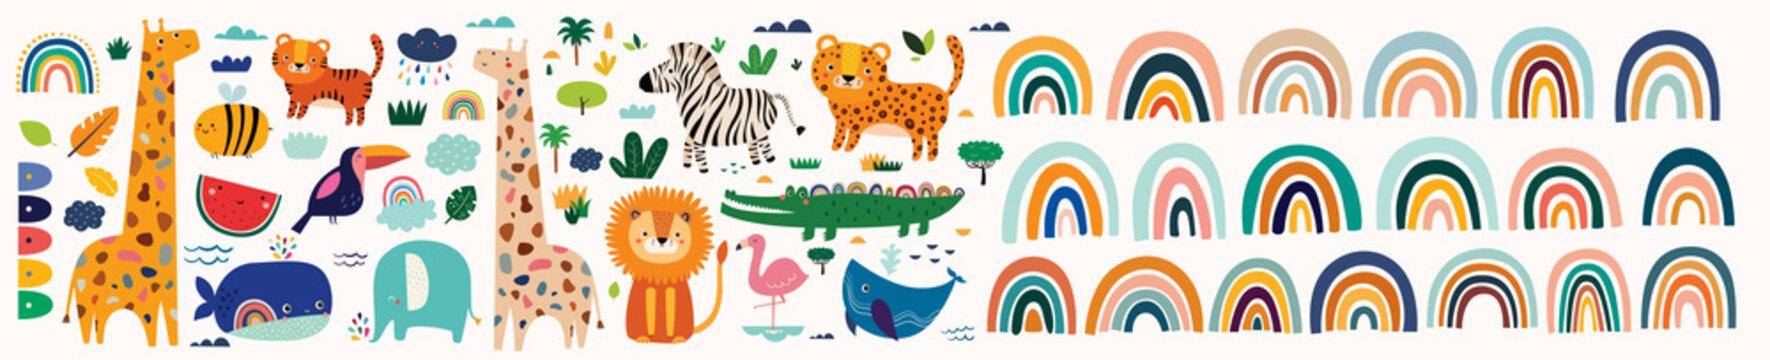 Colorful bright stylish trendy rainbows vector illustrations. Baby animals pattern. Fabric pattern. Vector illustration with cute animals. Nursery baby pattern illustration